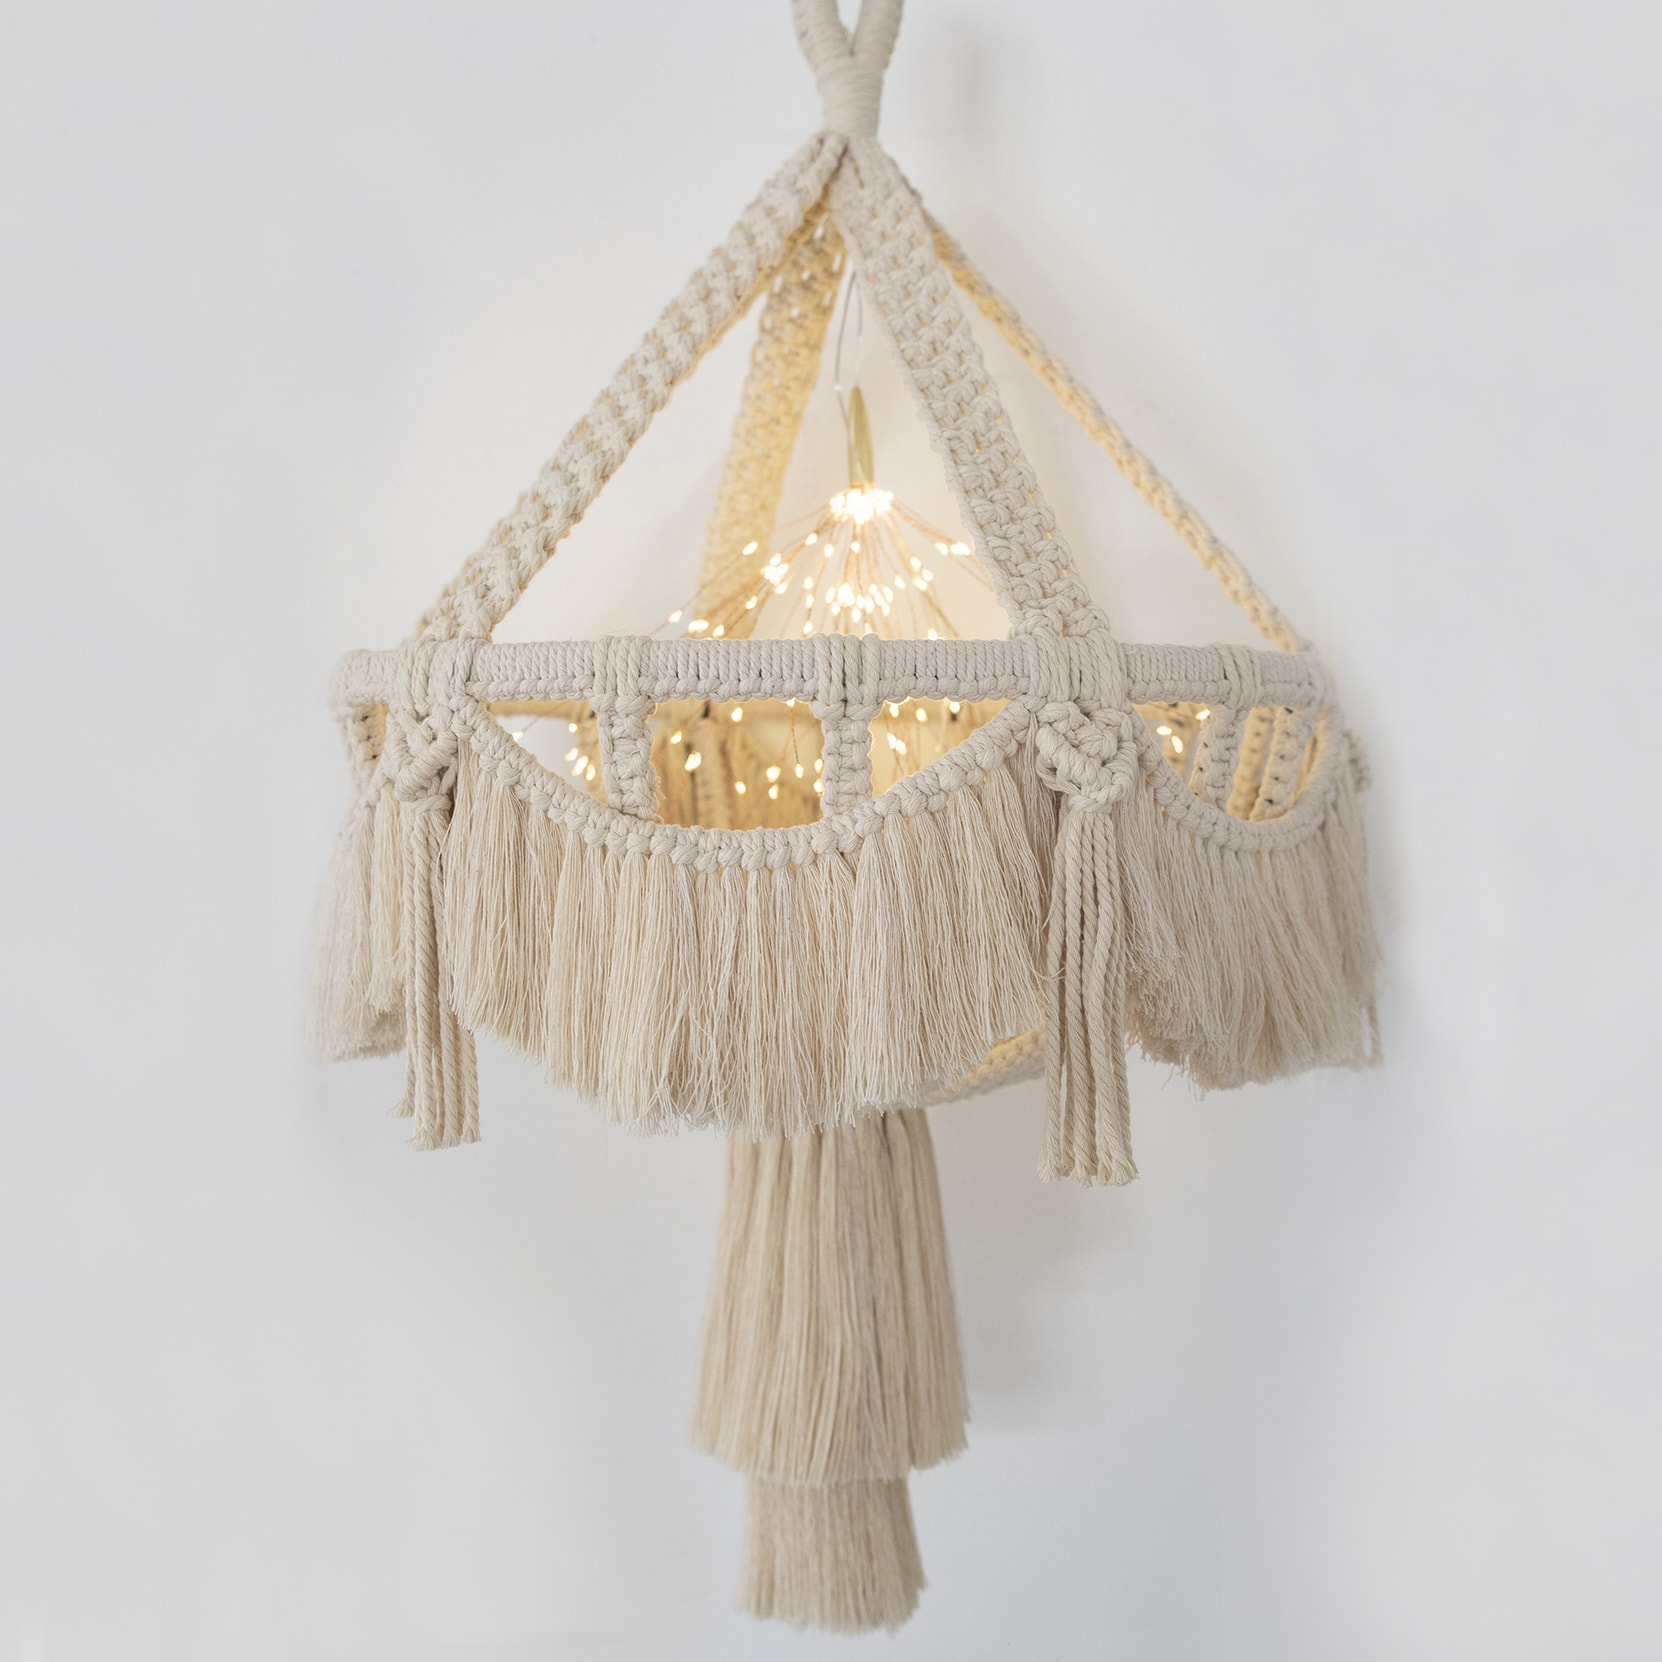 stylish DIY macrame chandelier made from planter basket